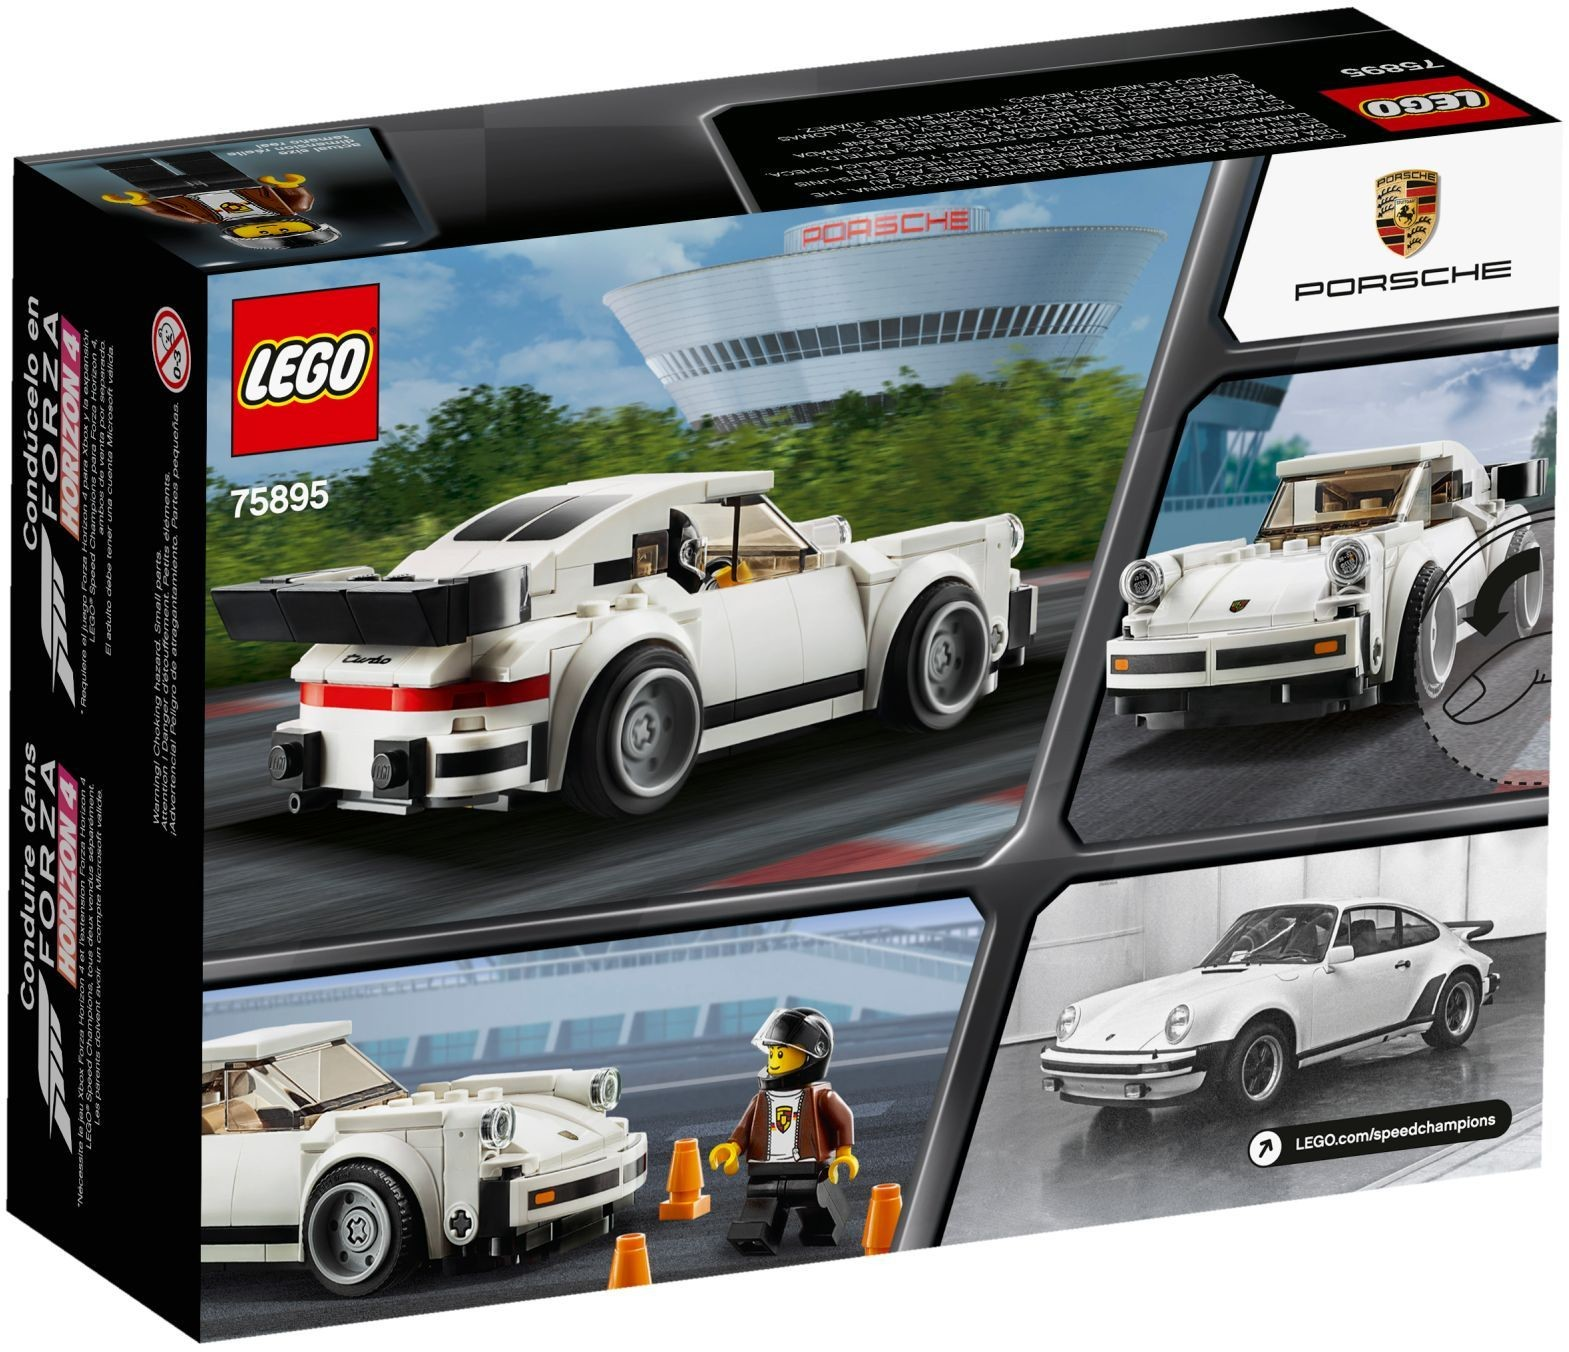 WANGE 2872 Super Racing Cars: Porsche 911 RSR and Porsche 911 Turbo 3.0 10